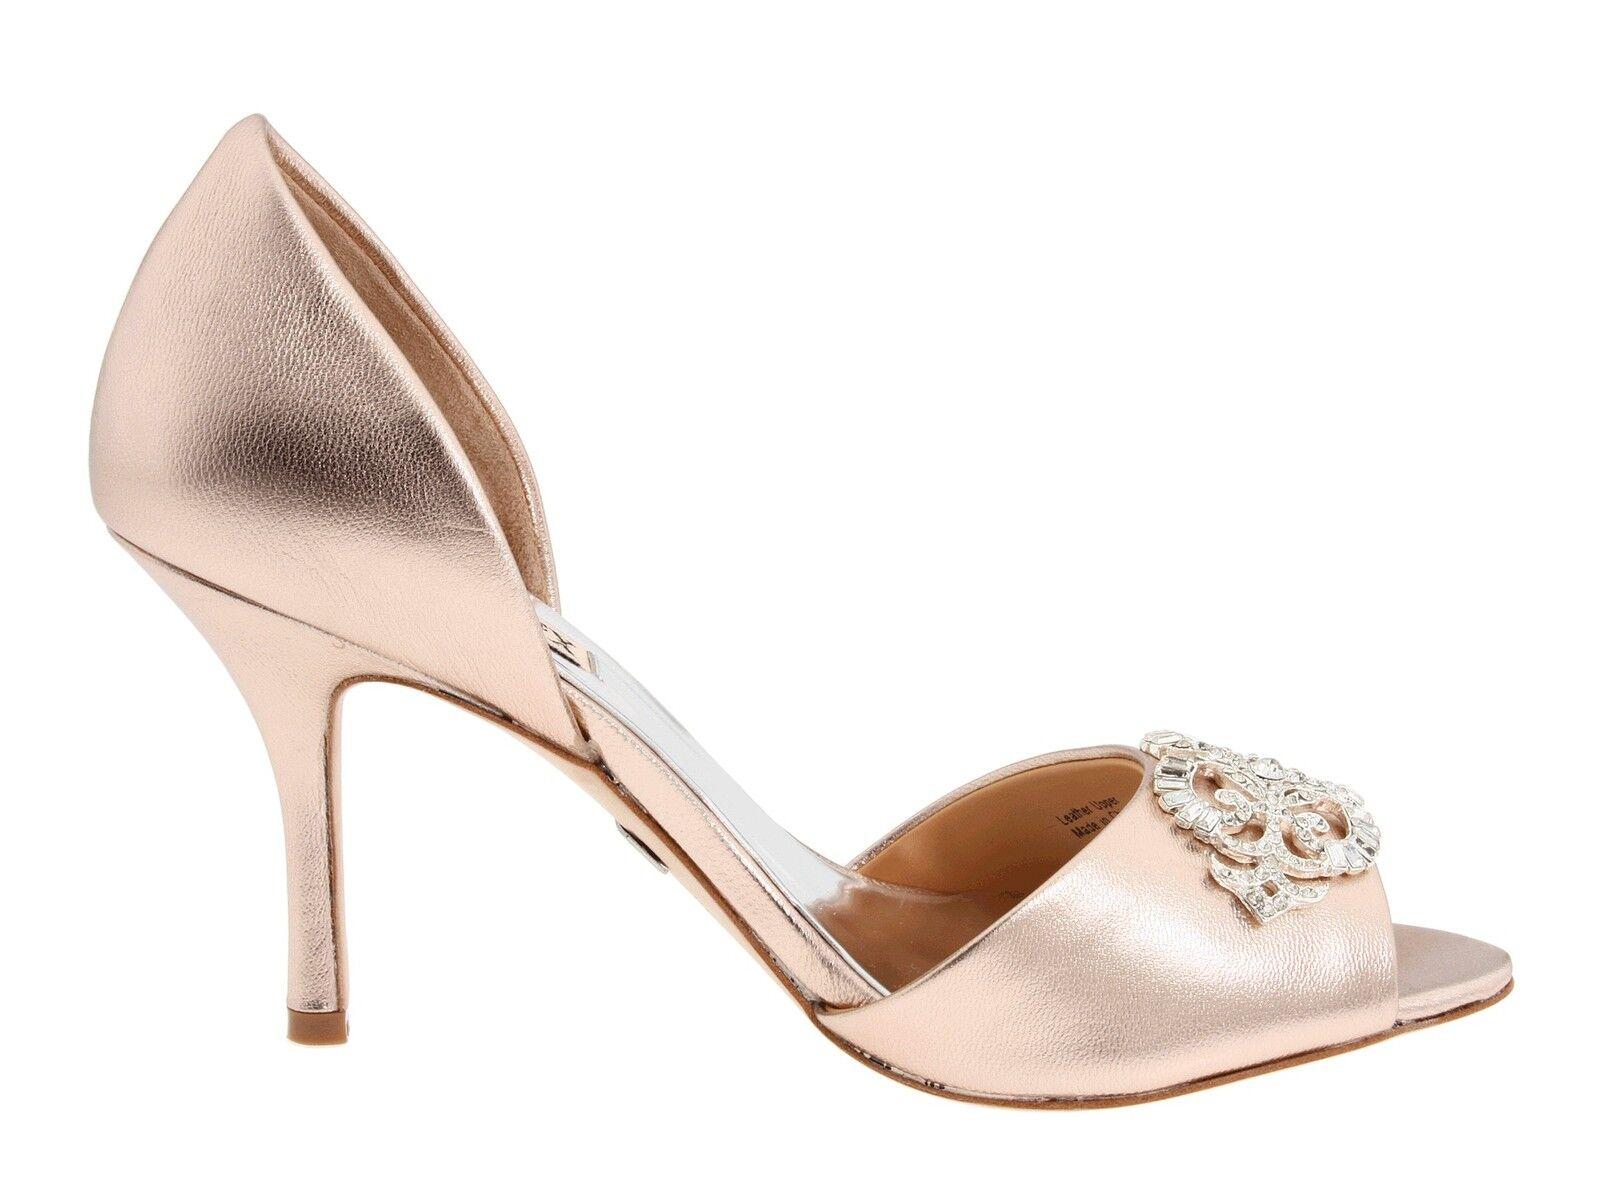 clienti prima reputazione prima Badgley Mischka Mischka Mischka SALSA leather D'orsey heels sandals open scarpe rosa oro 6 M NIB  una marca di lusso